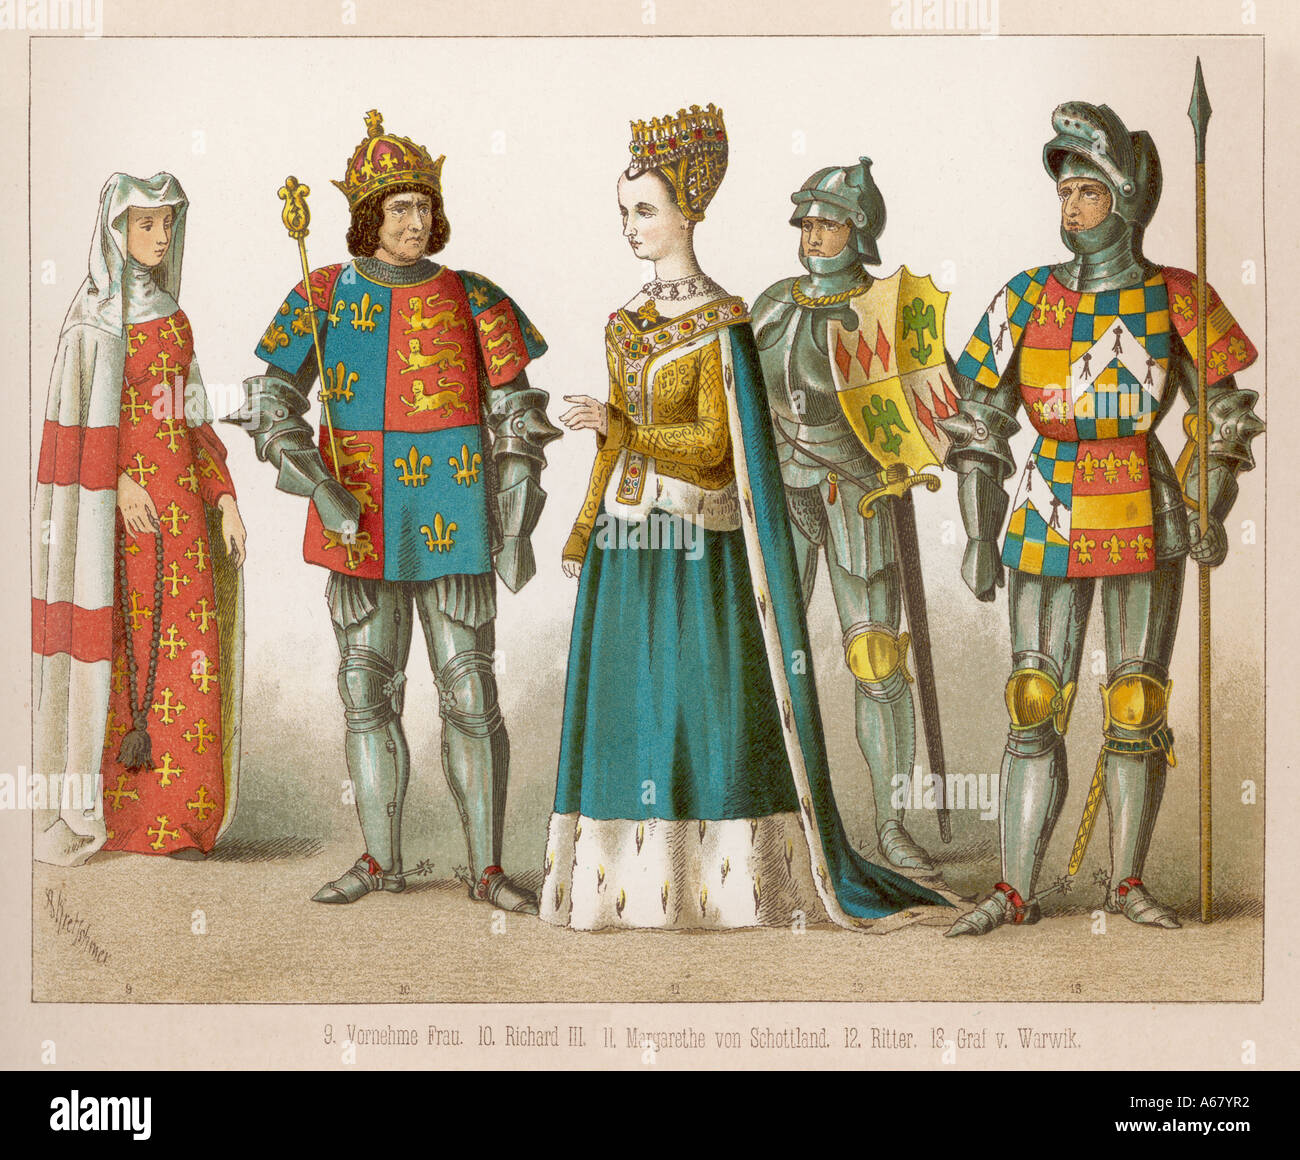 English Lady & Knight on Behance